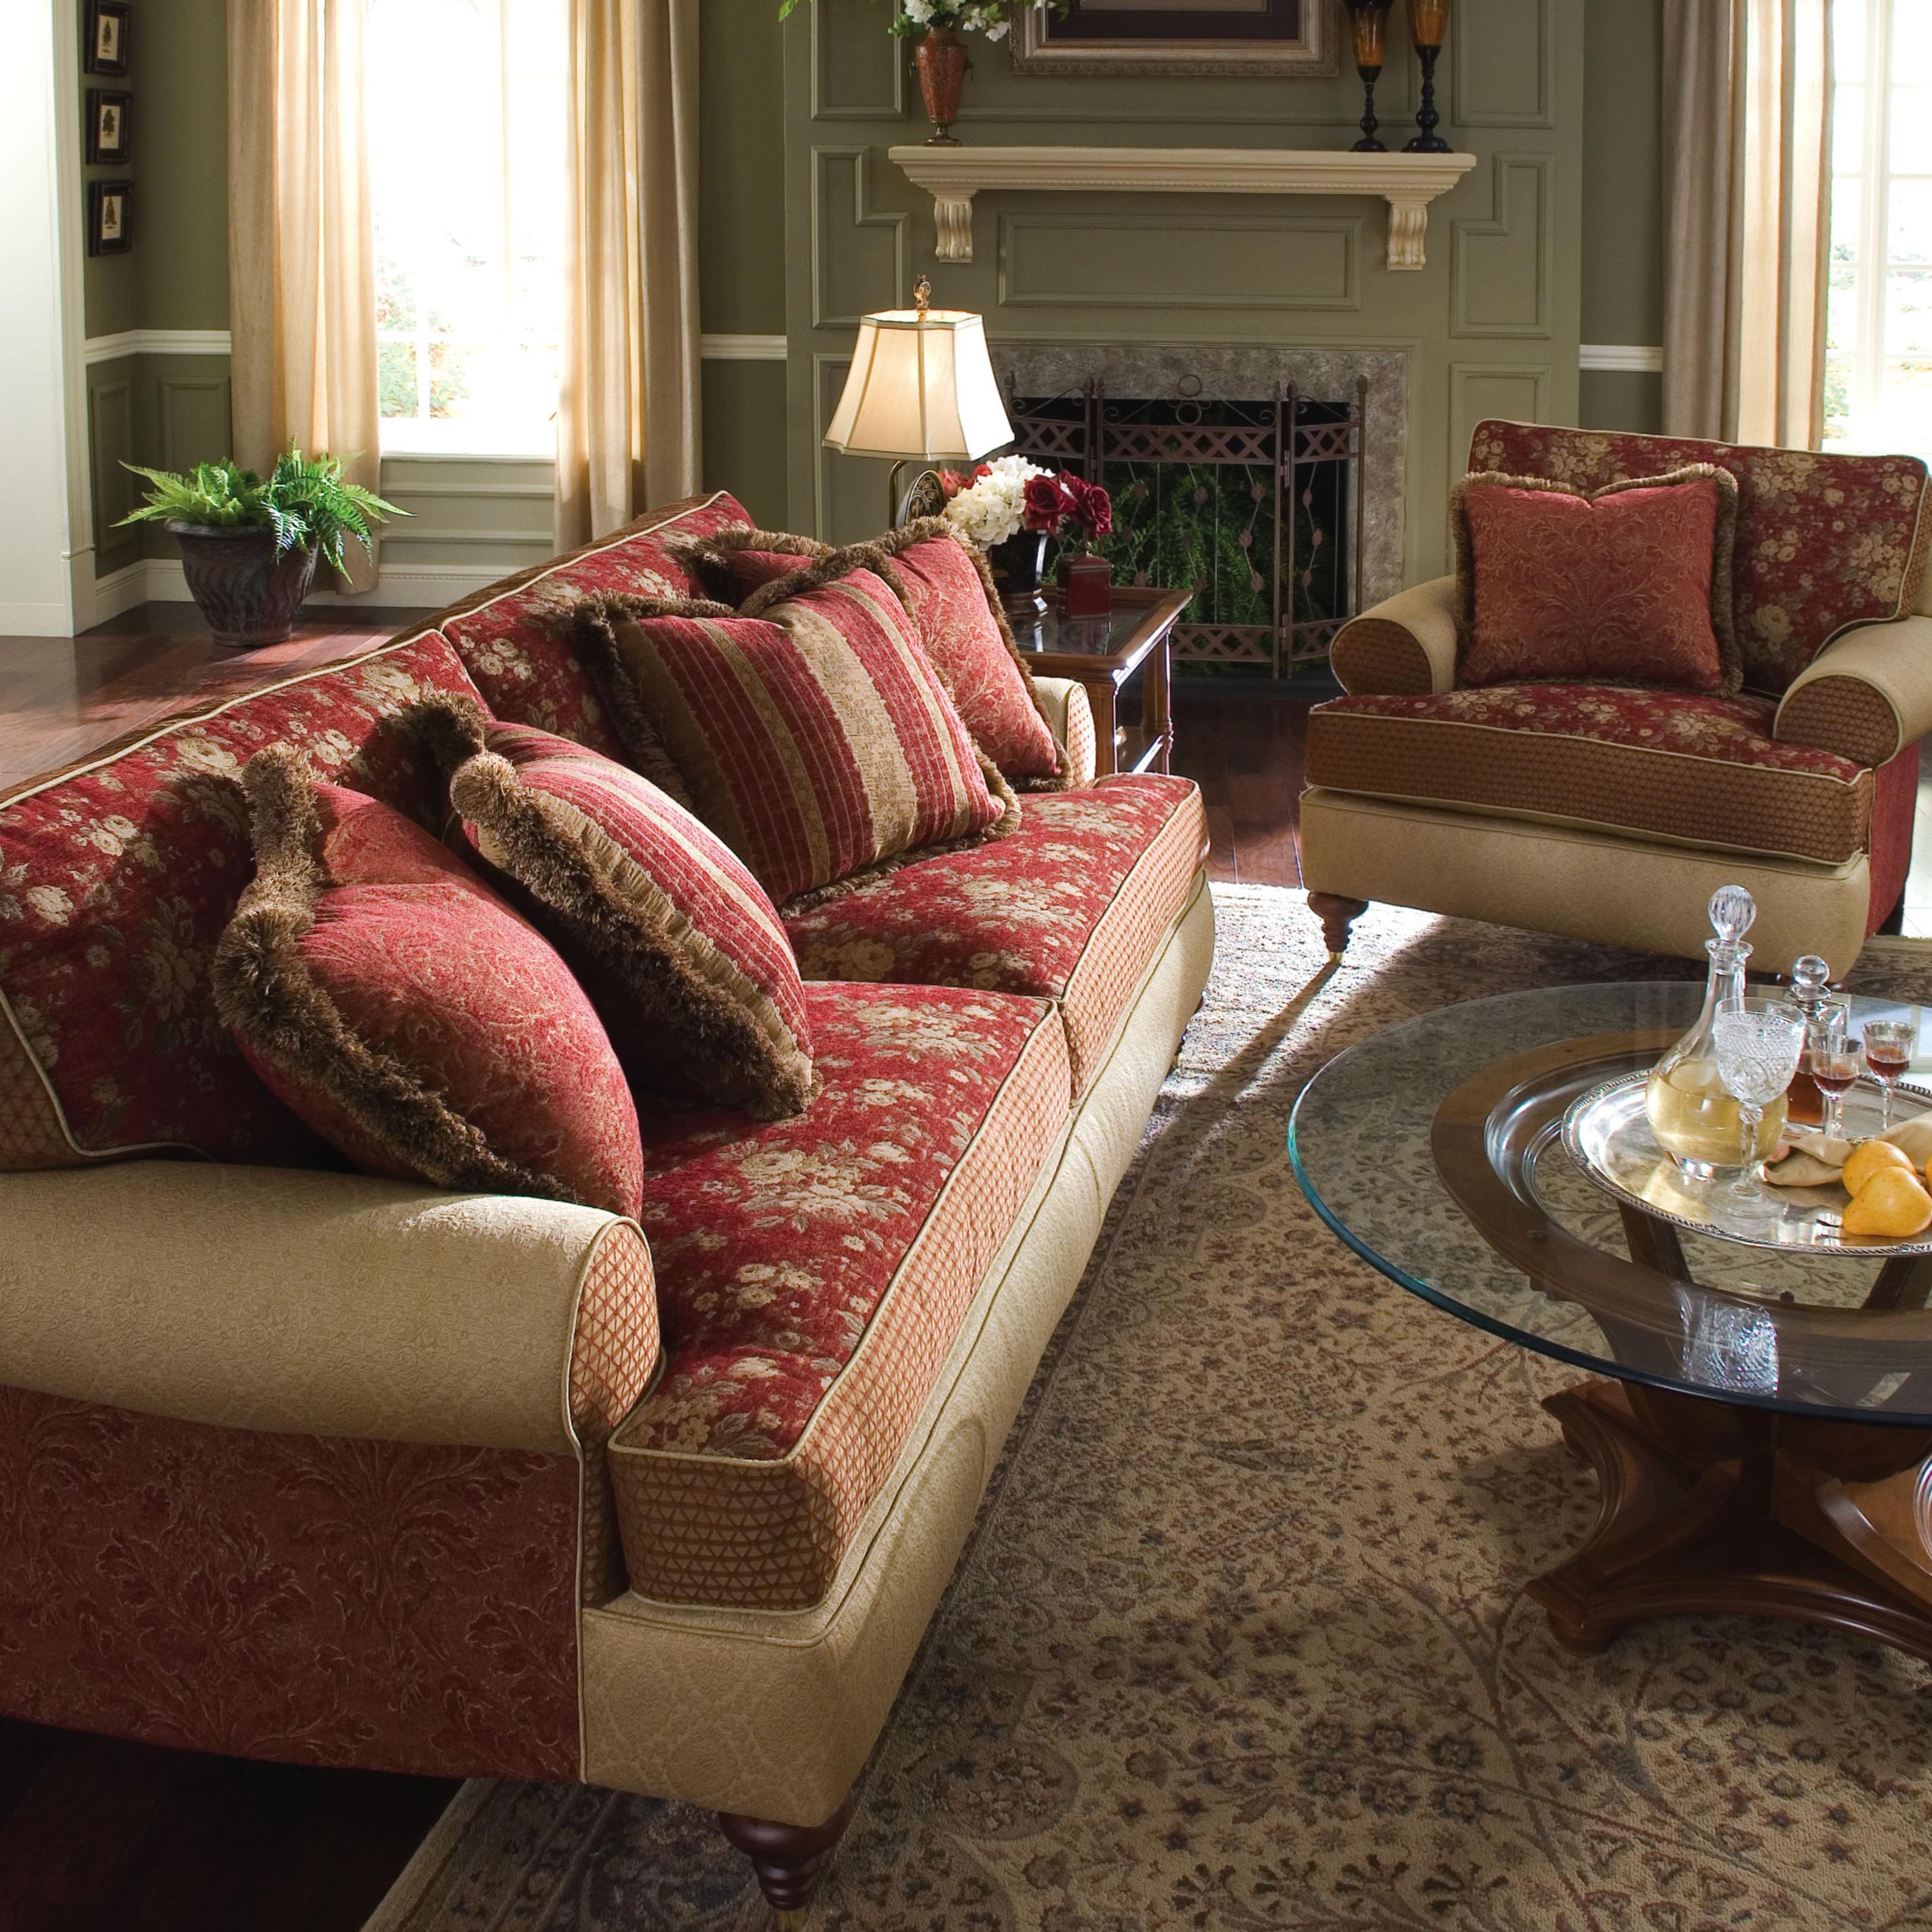 Tuscany 803 by Kincaid Furniture Hudson s Furniture Kincaid